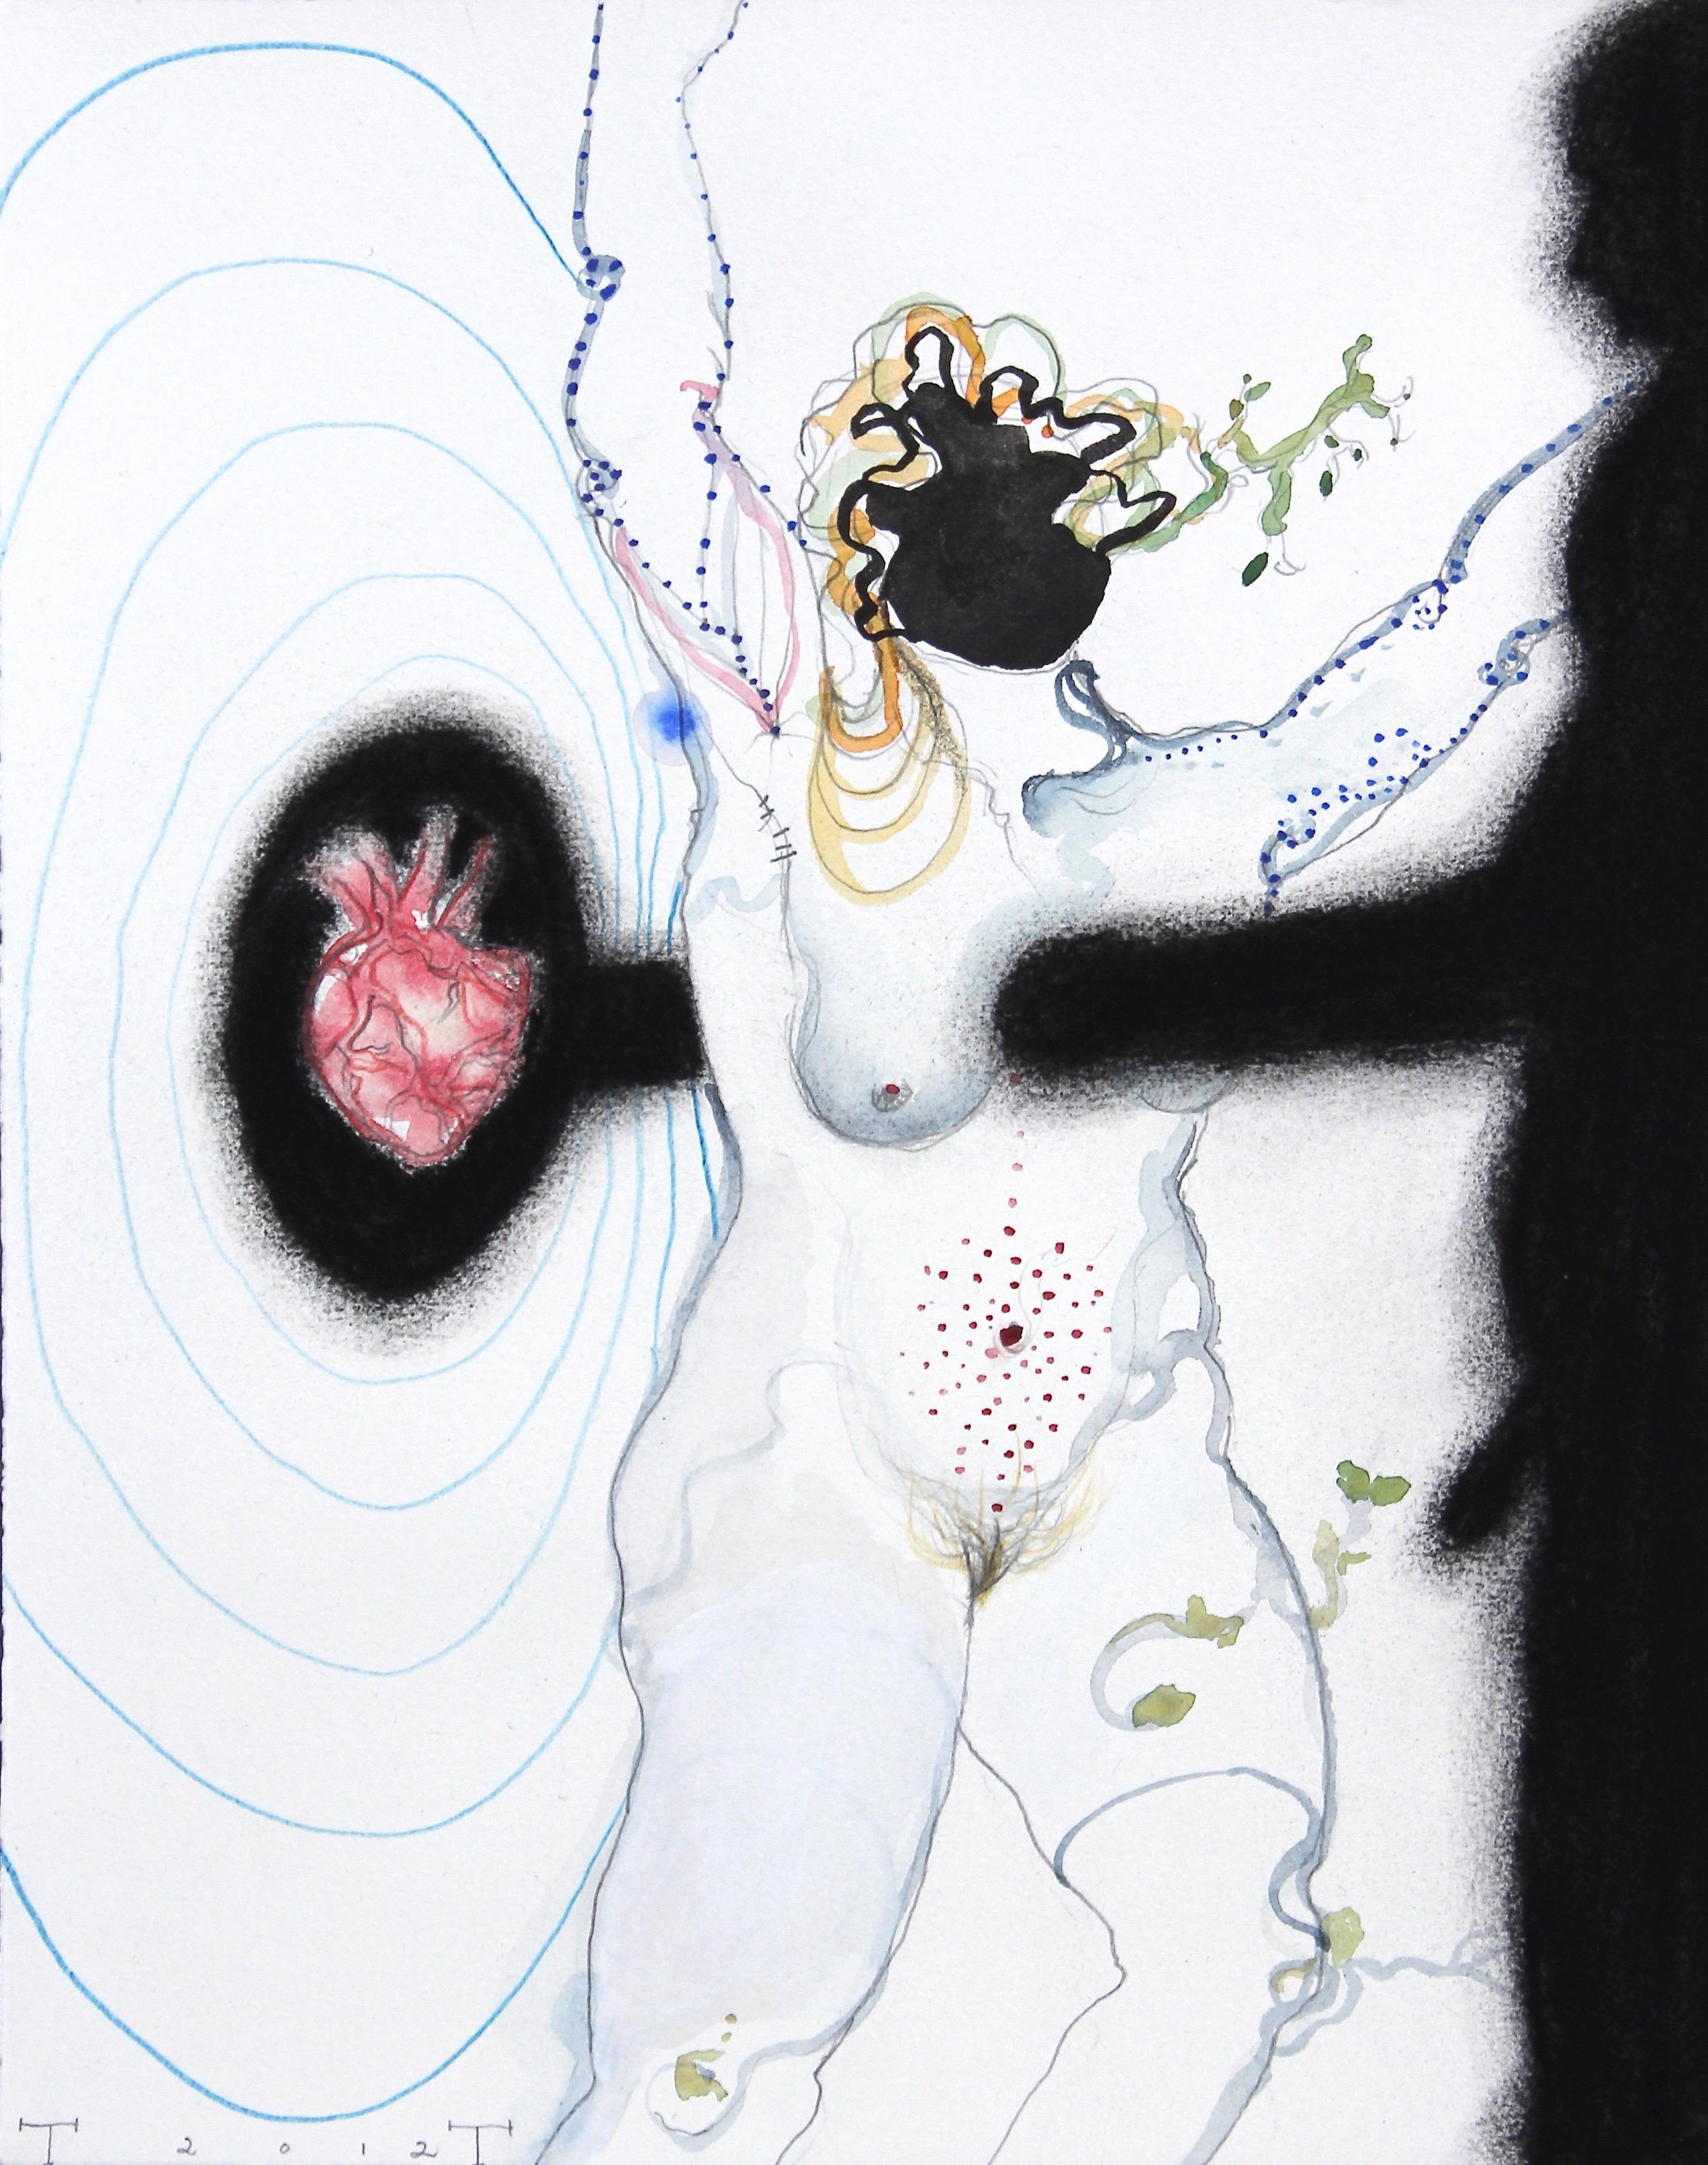 'Persephone' study, mixed media on paper, 33 X 25 cm, 2012